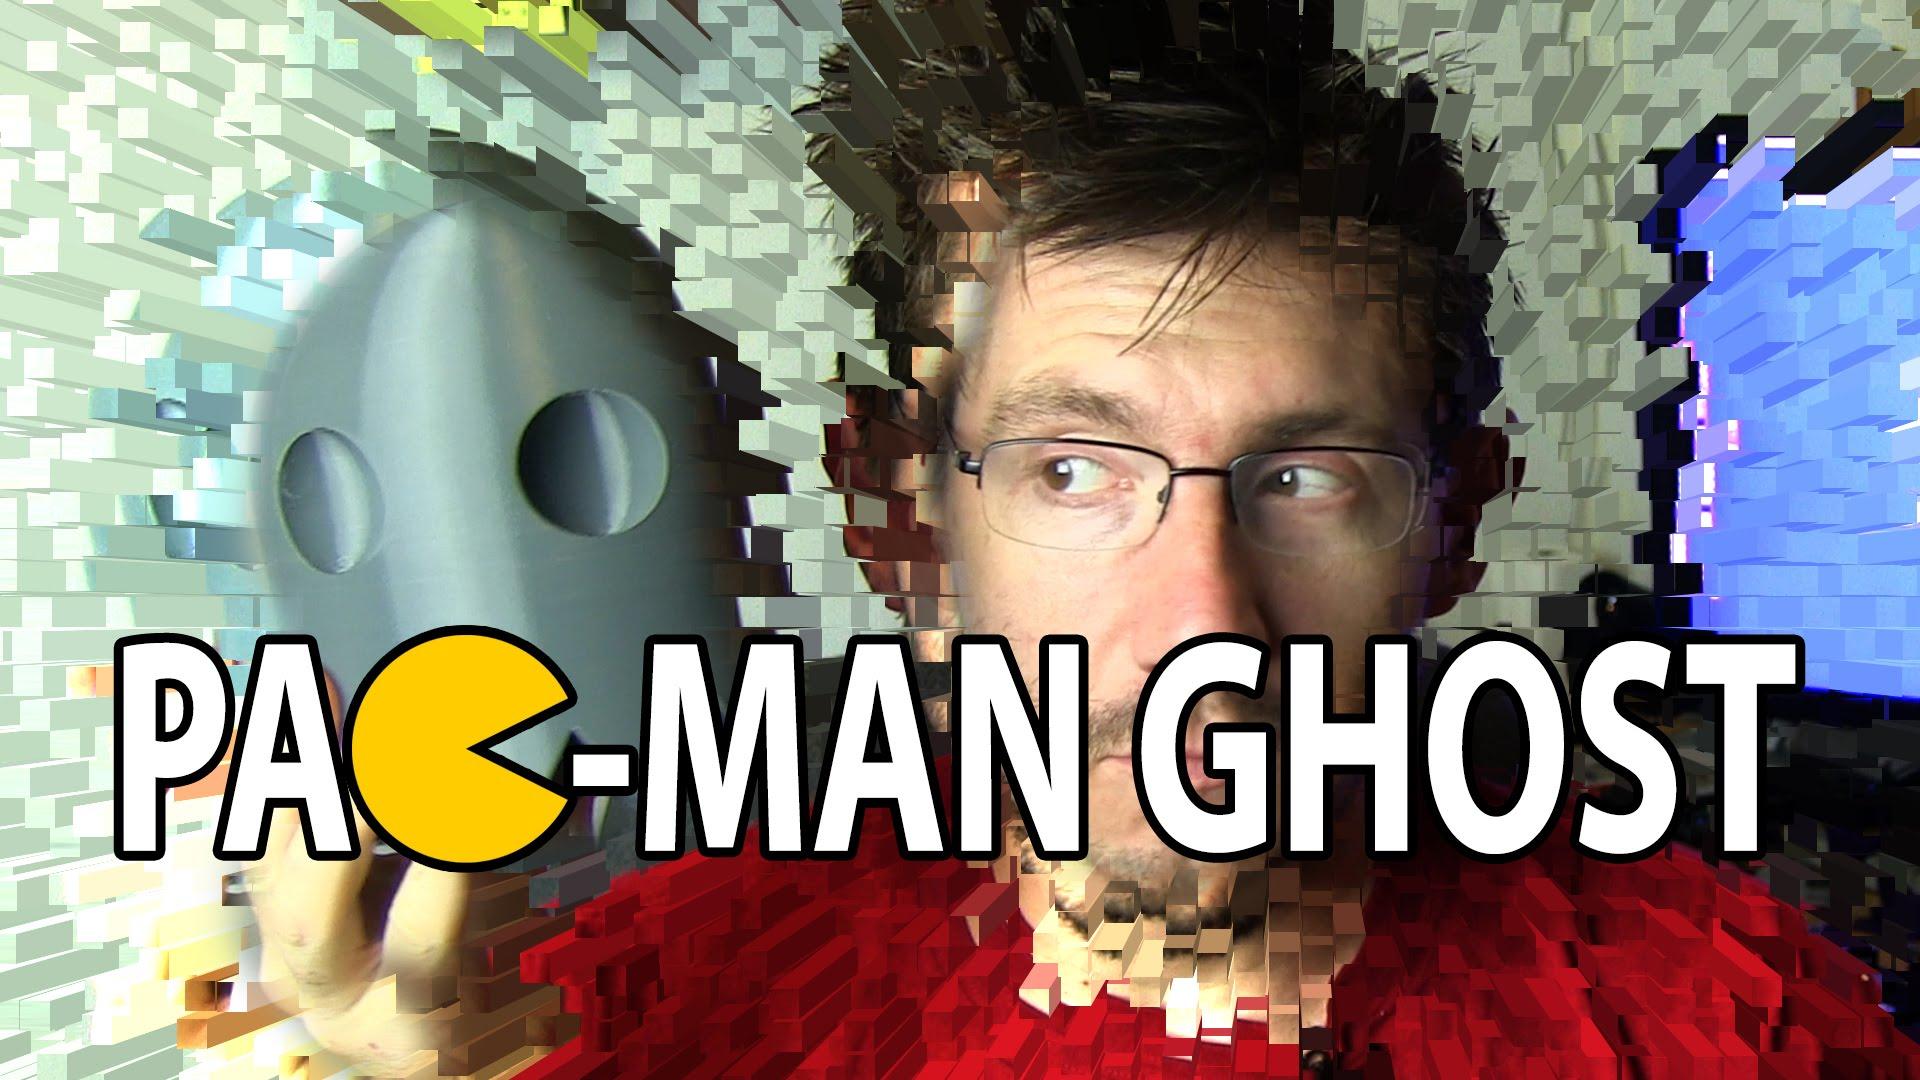 3D Printing: Pac-Man Ghost